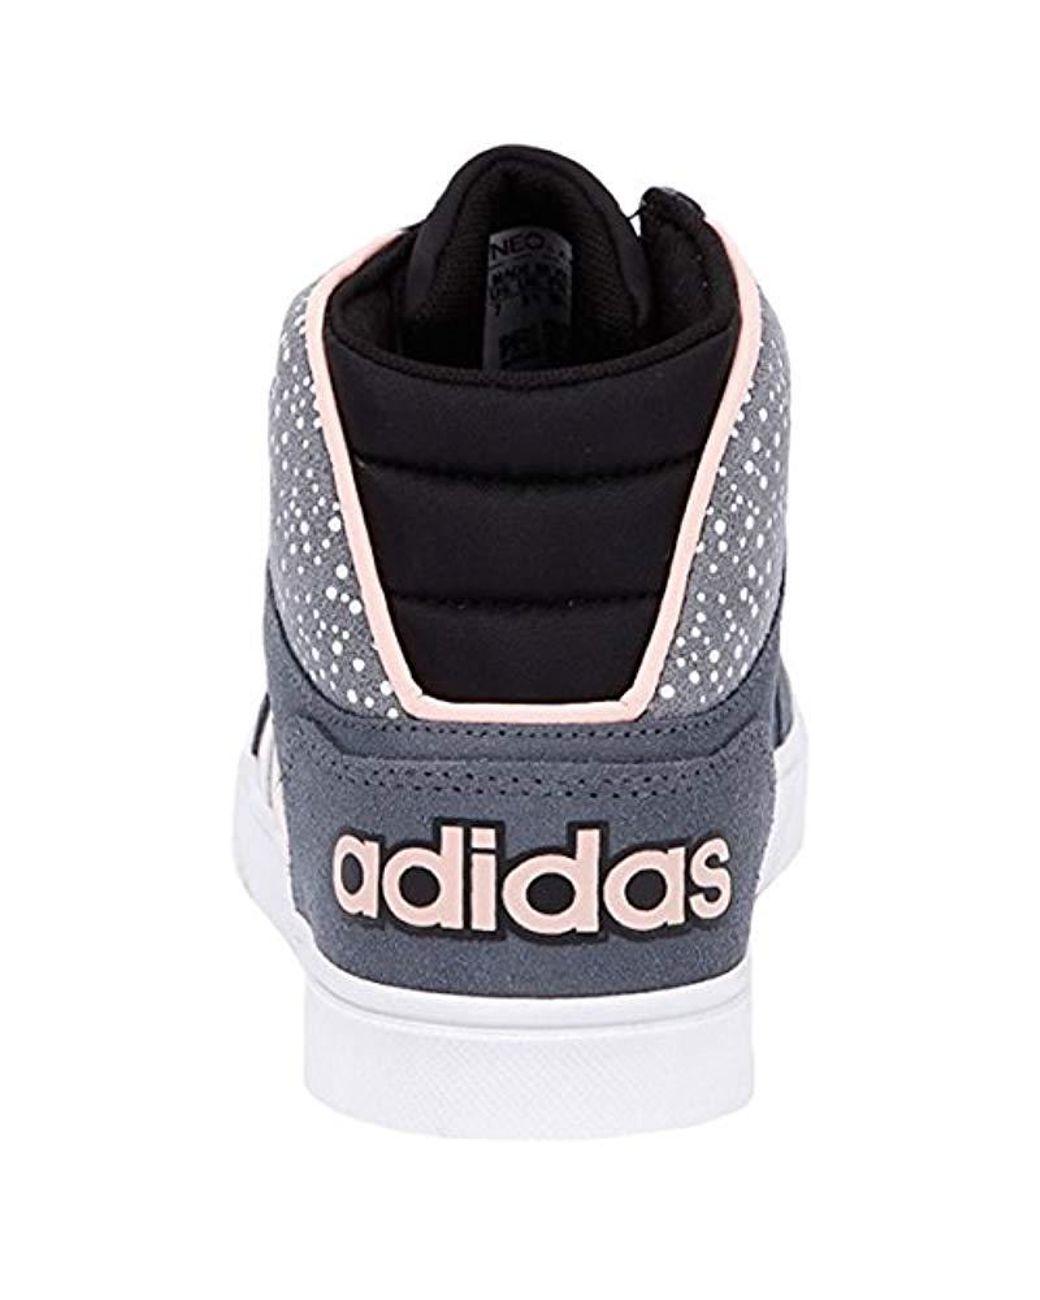 adidas Neo Hoops Vulc Daily Twist Mid Trainers Hi Top Vl Gym